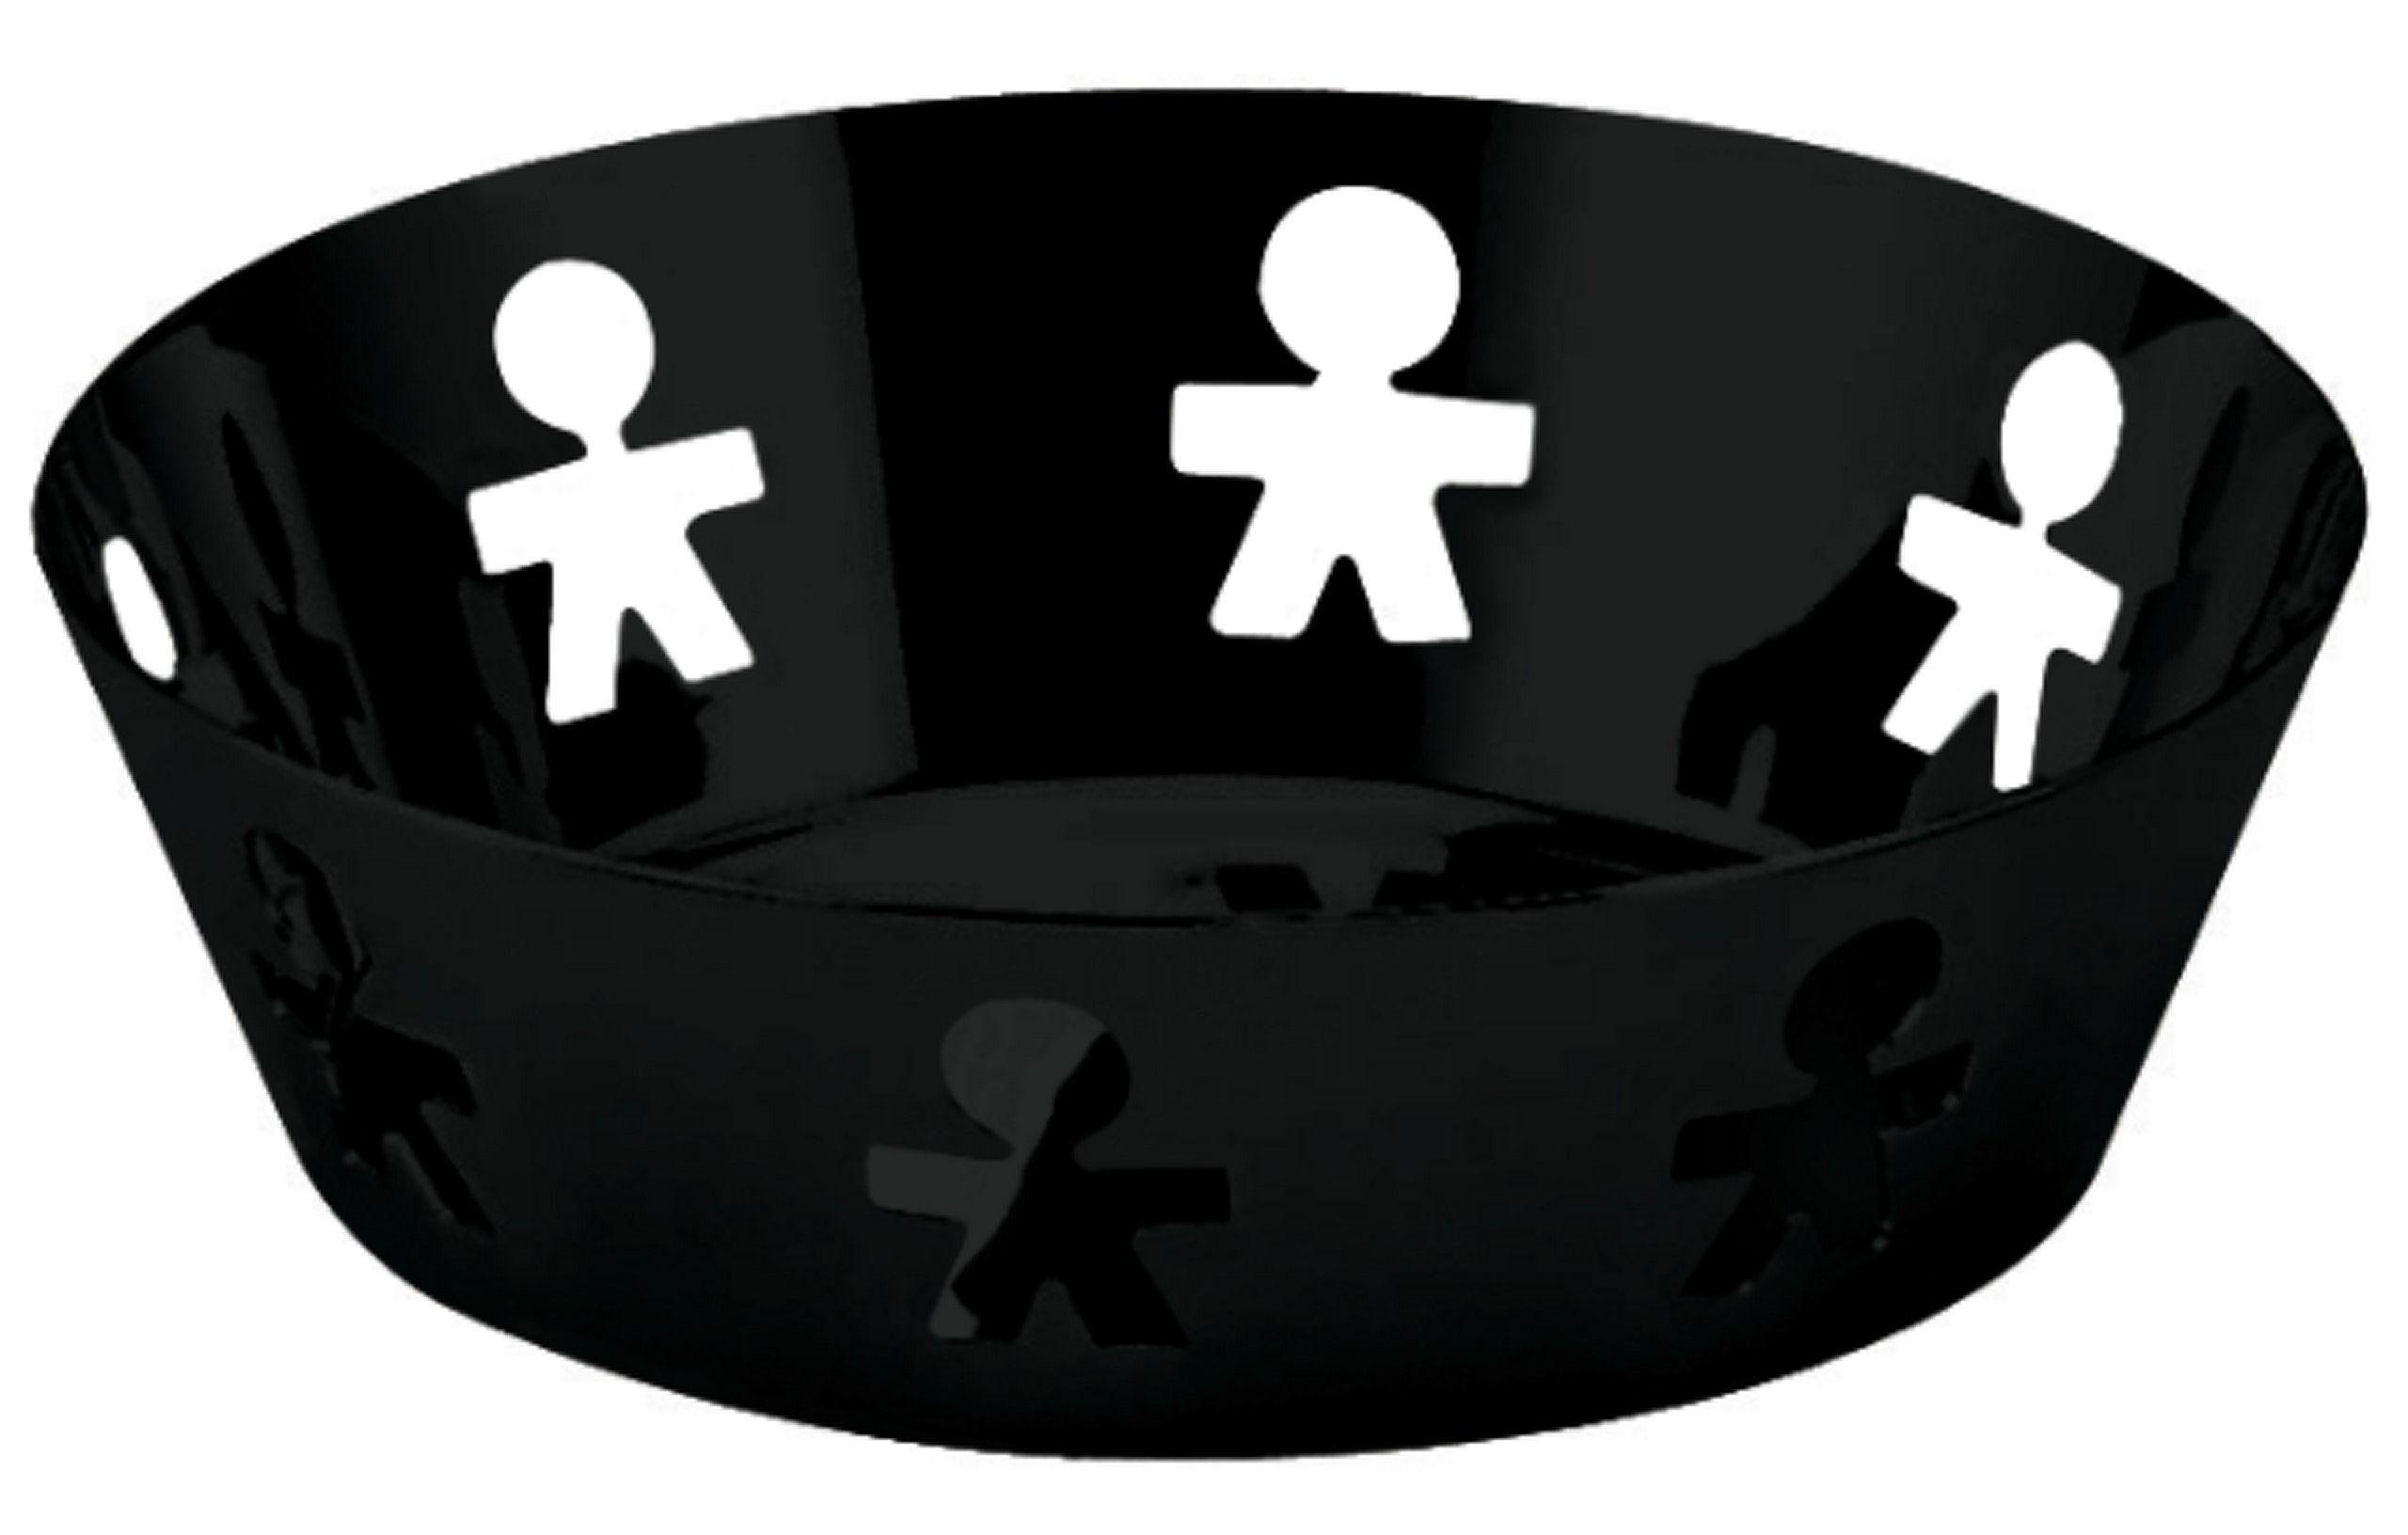 Accessoires - Accessoires salle de bains - Corbeille Girotondo / Ø 18 cm - A di Alessi - Noir - Ø 18,1 cm - Acier inoxydable